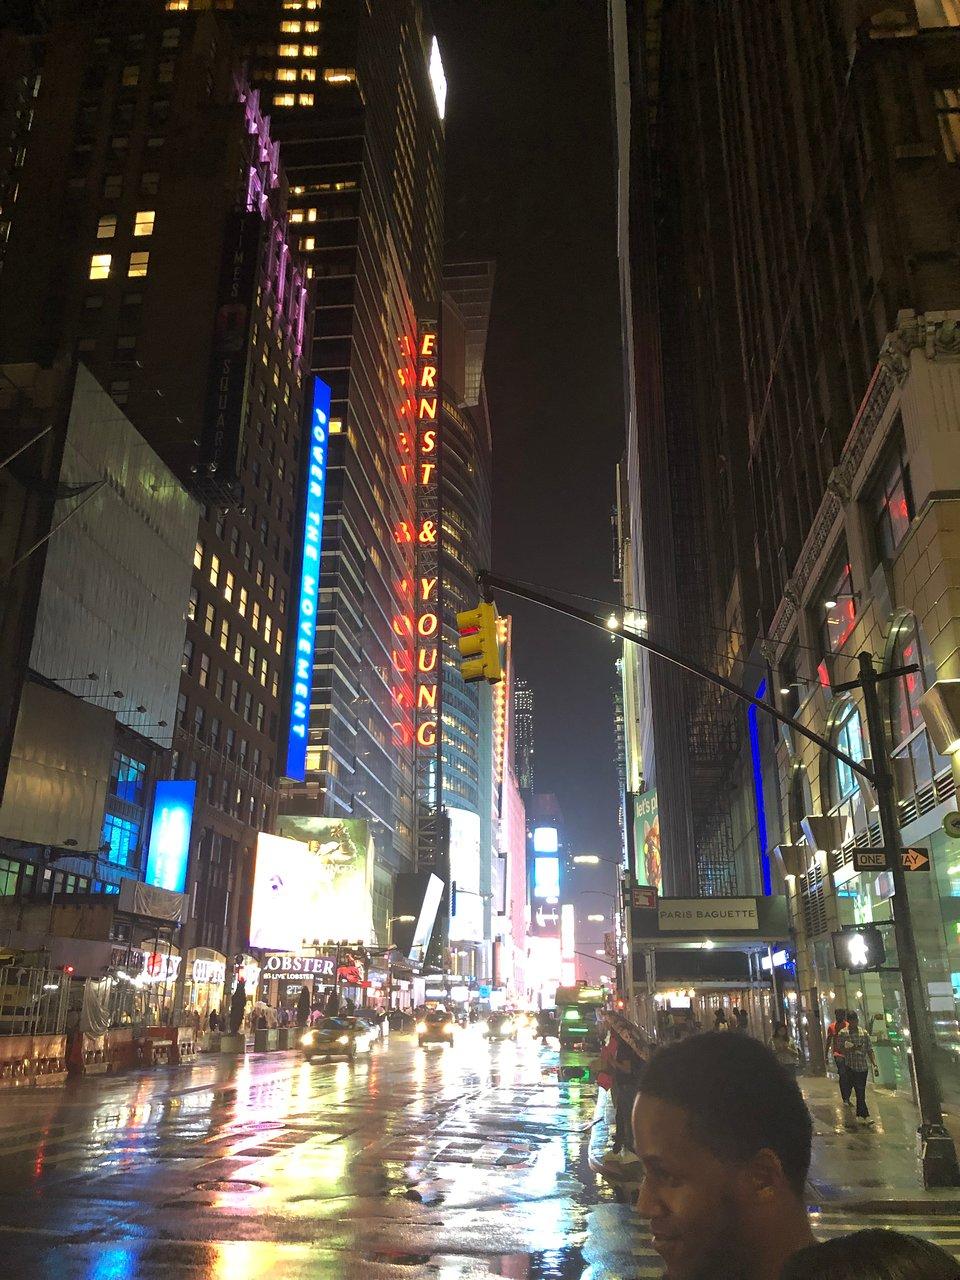 zadarmo online dátumu lokalít v New Yorku